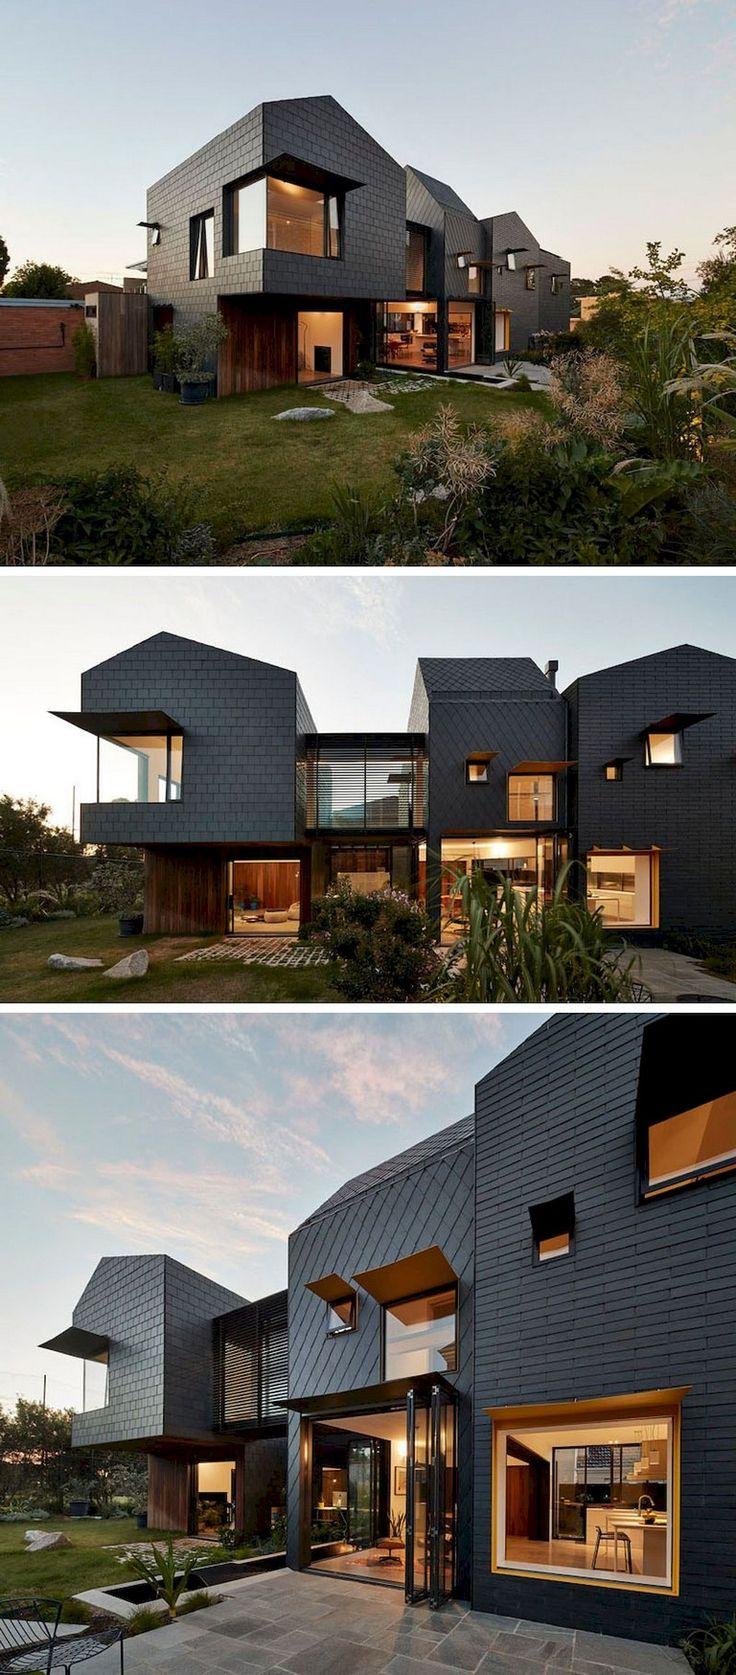 80 Marvelous Modern House Architecture Design Ideas Architecture House Architecture Design Architecture Design